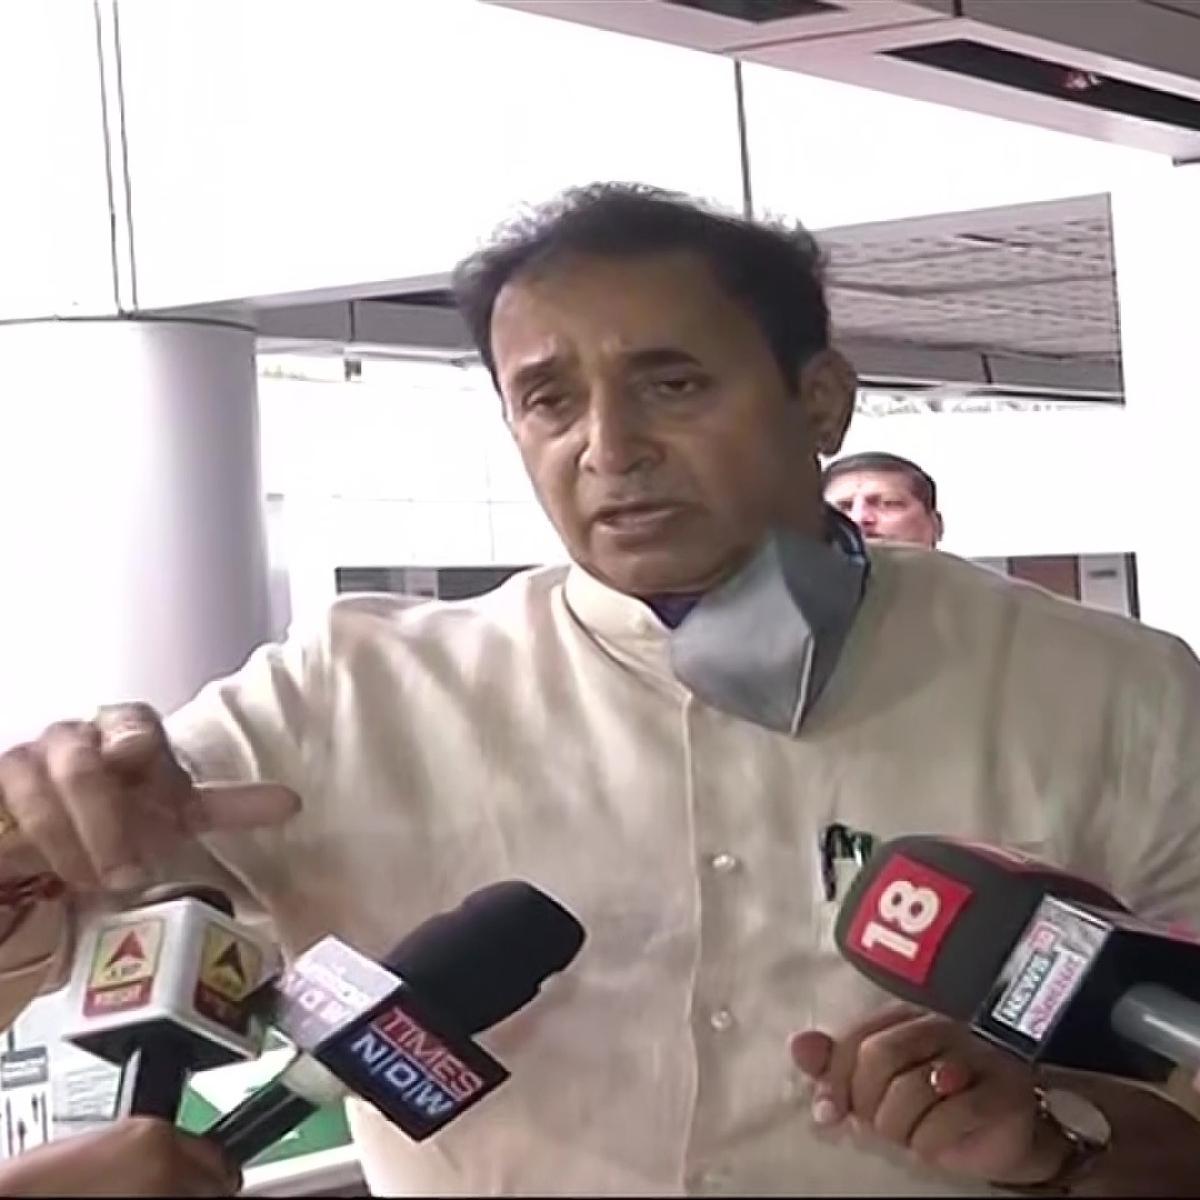 BJP 'ready to risk children's lives' during protest: Deshmukh